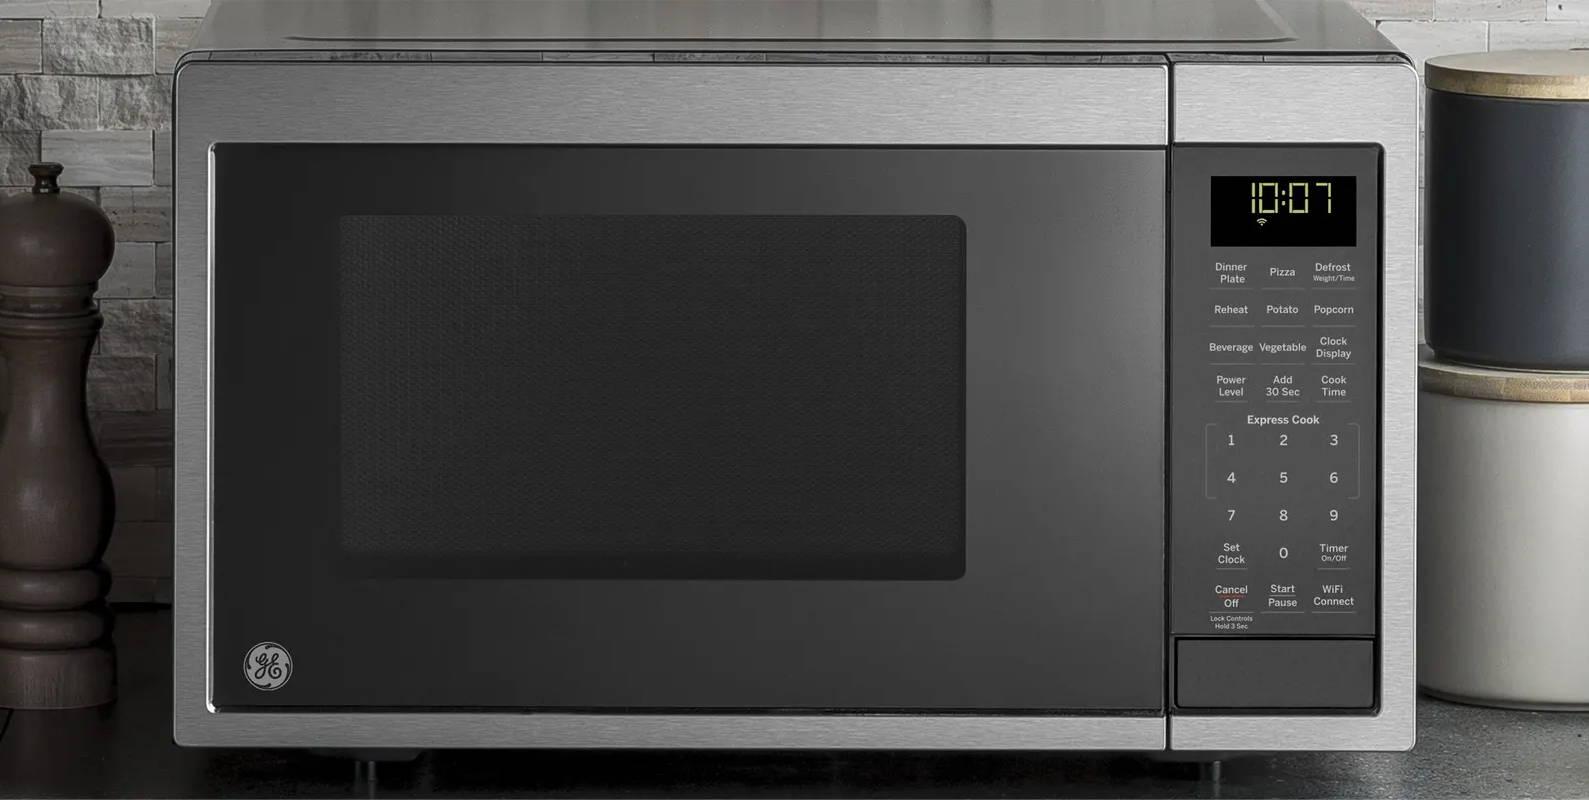 Ge Smart Microwave Ovens Liances